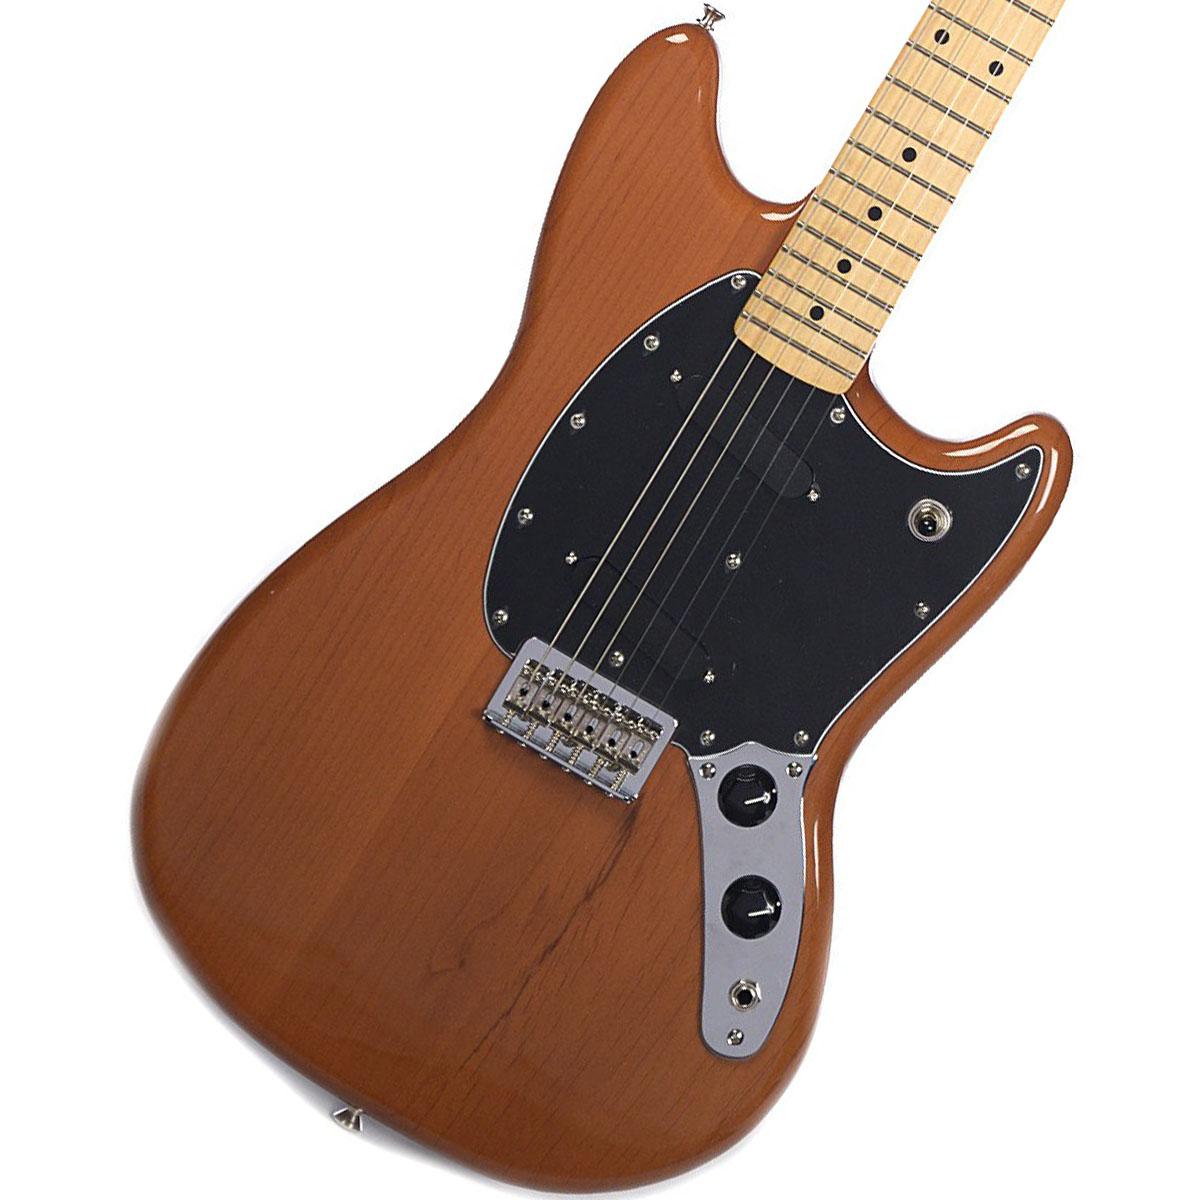 Fender / Limited Edition Mustang Maple Fingerboard Faded Mocha 限定カラーモデル《カスタムショップのお手入れ用品を進呈/+671038200》